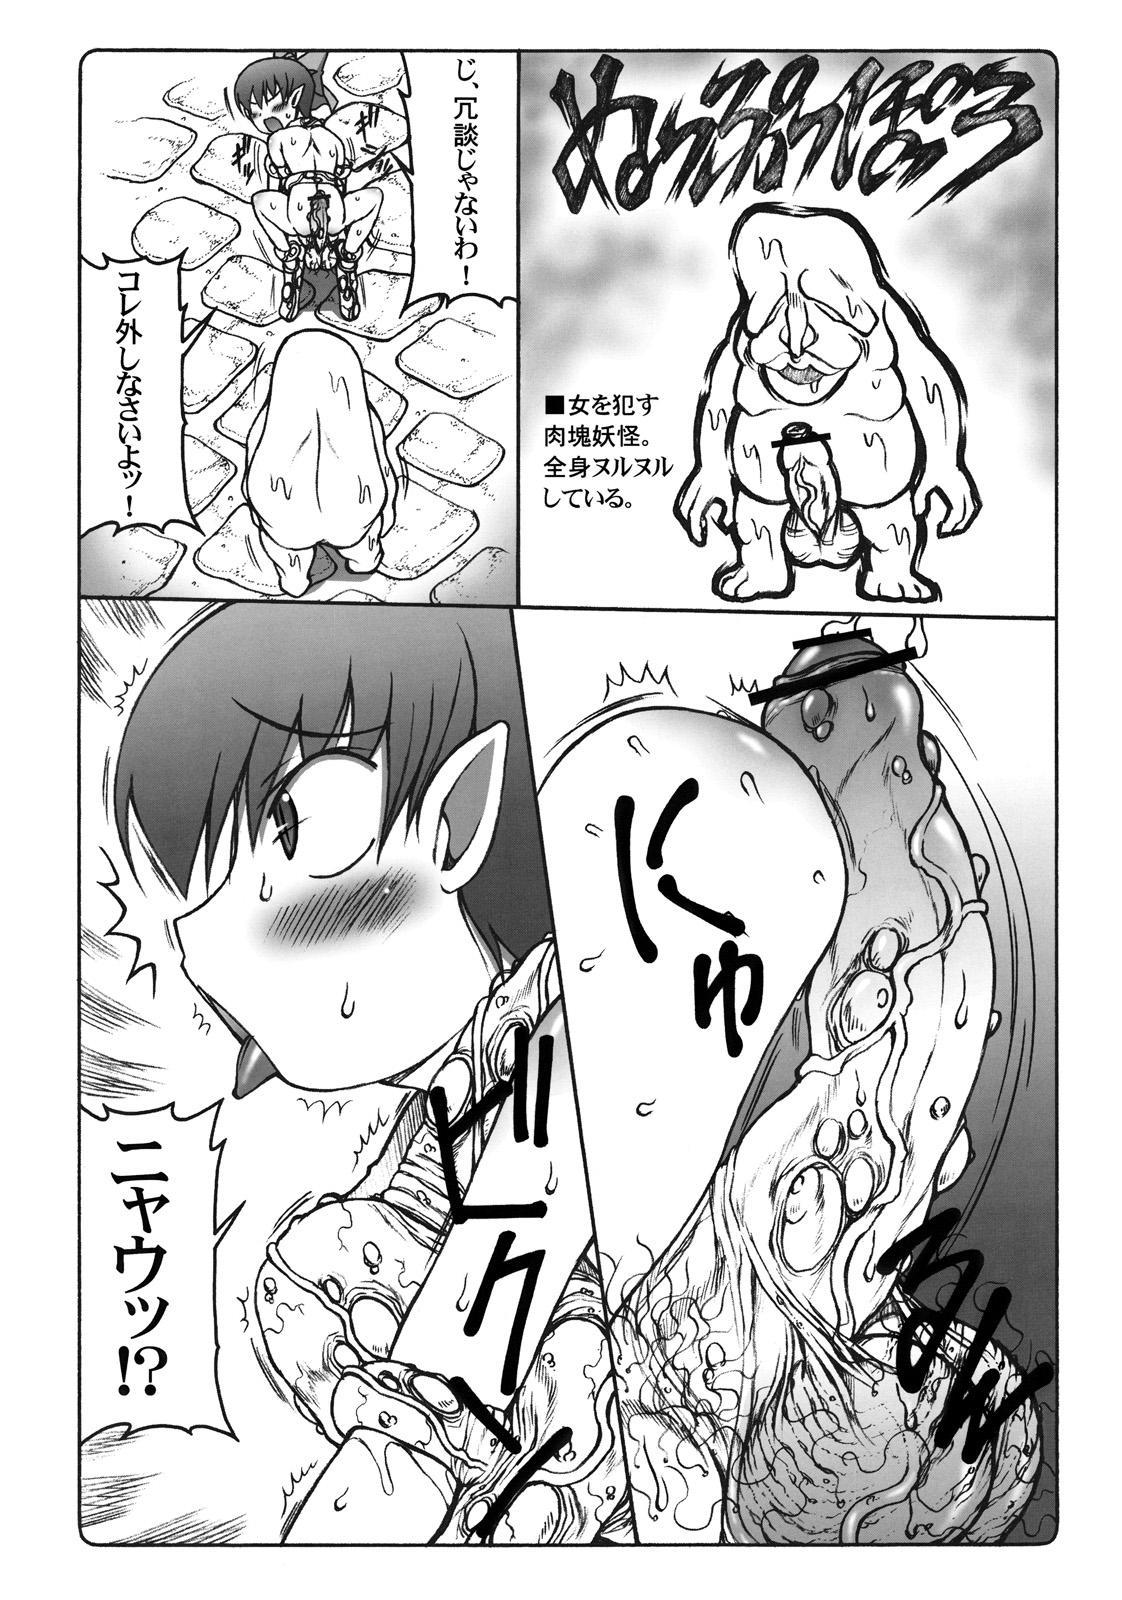 Nuko Musume VS Youkai Nuppuppou 6